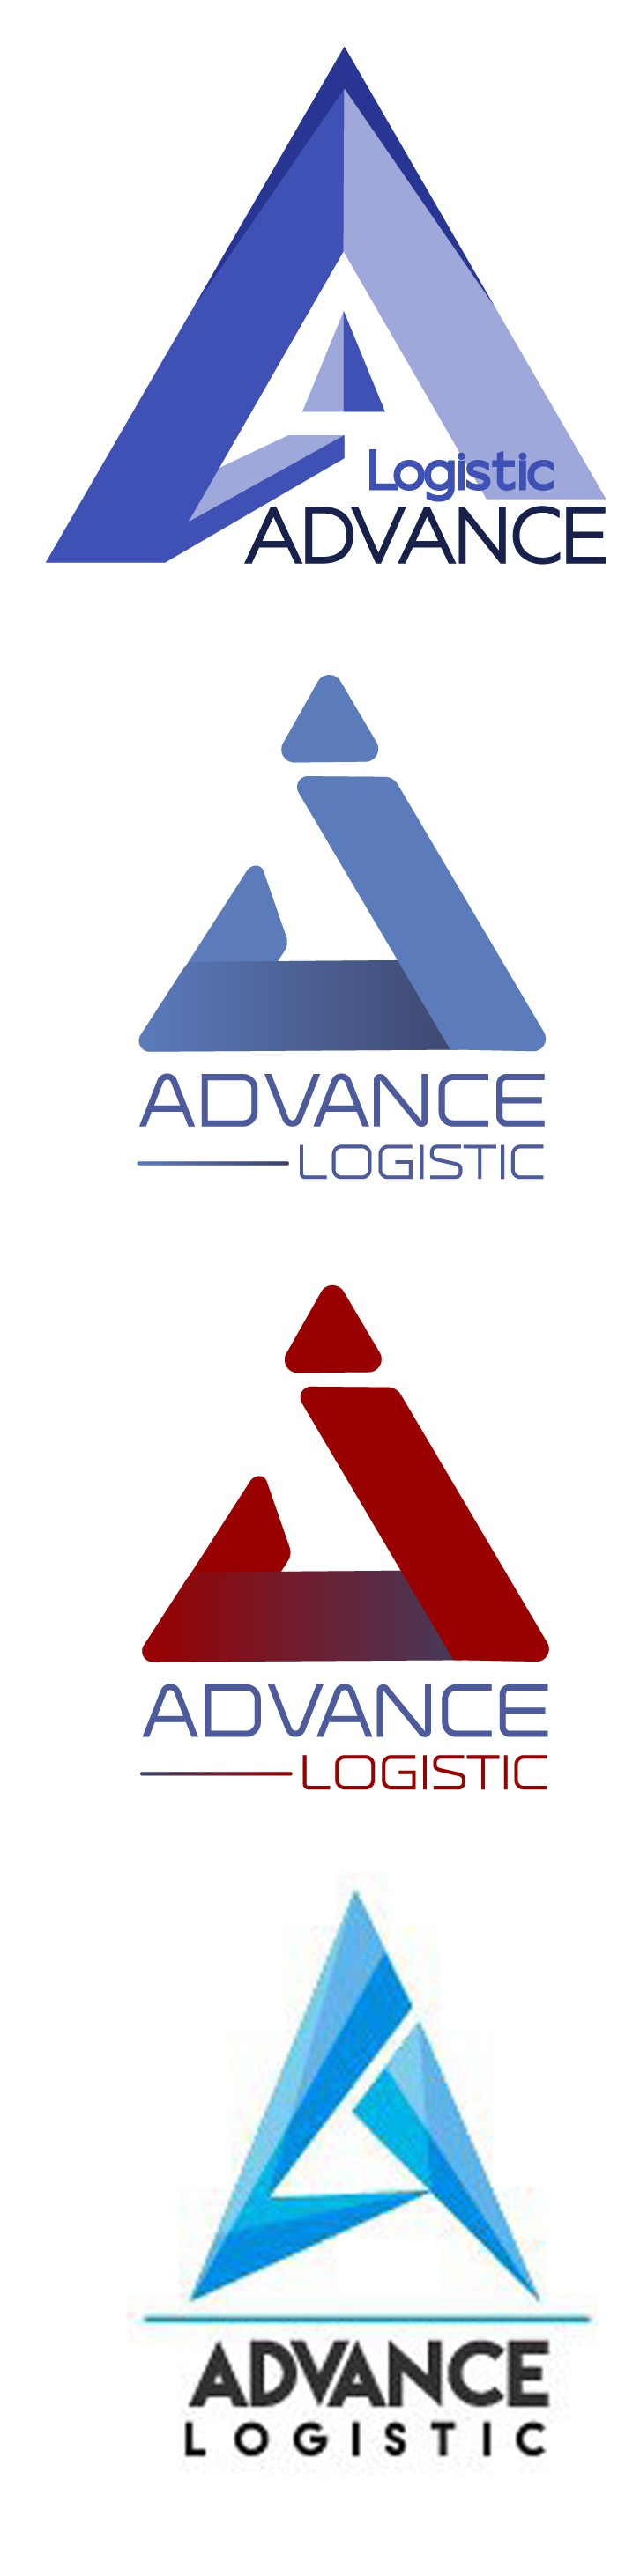 Лого advance logistic варианты